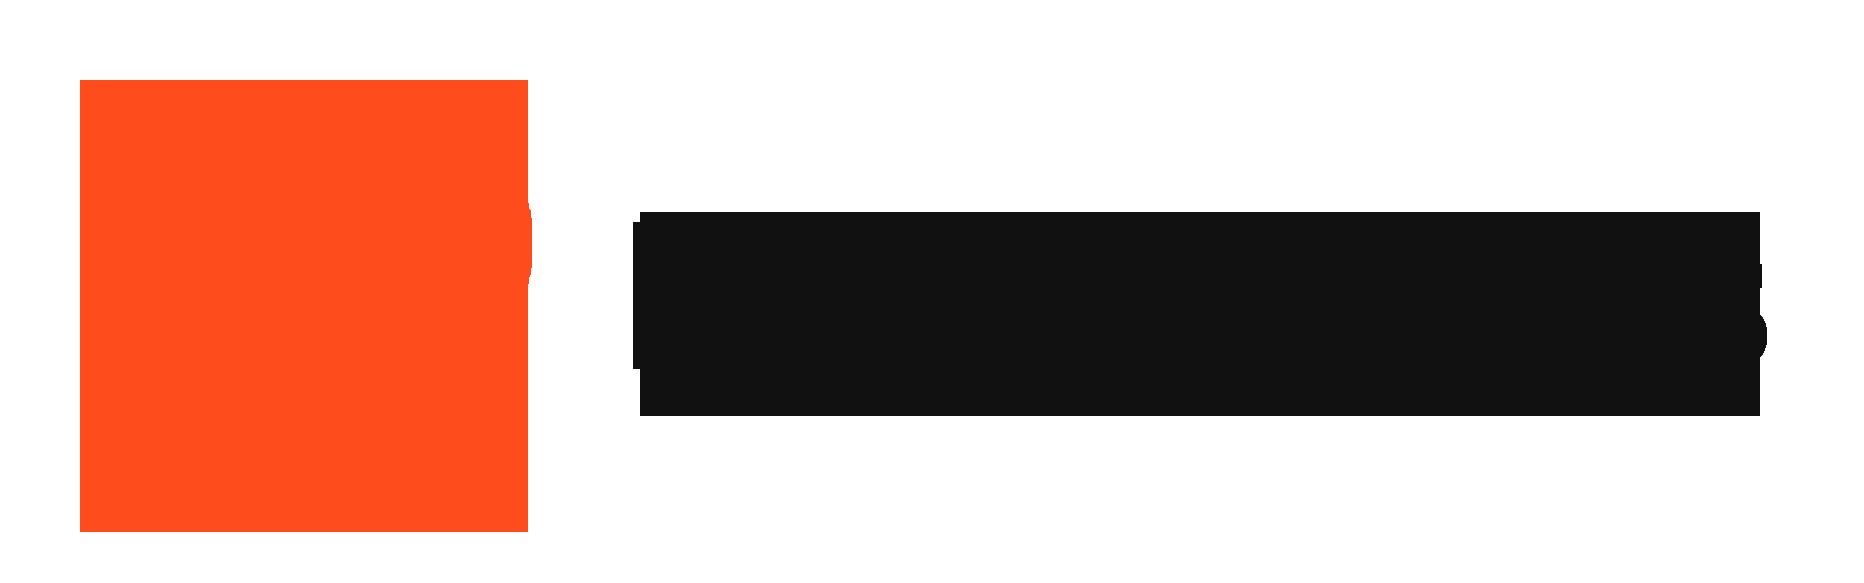 Digitalgods